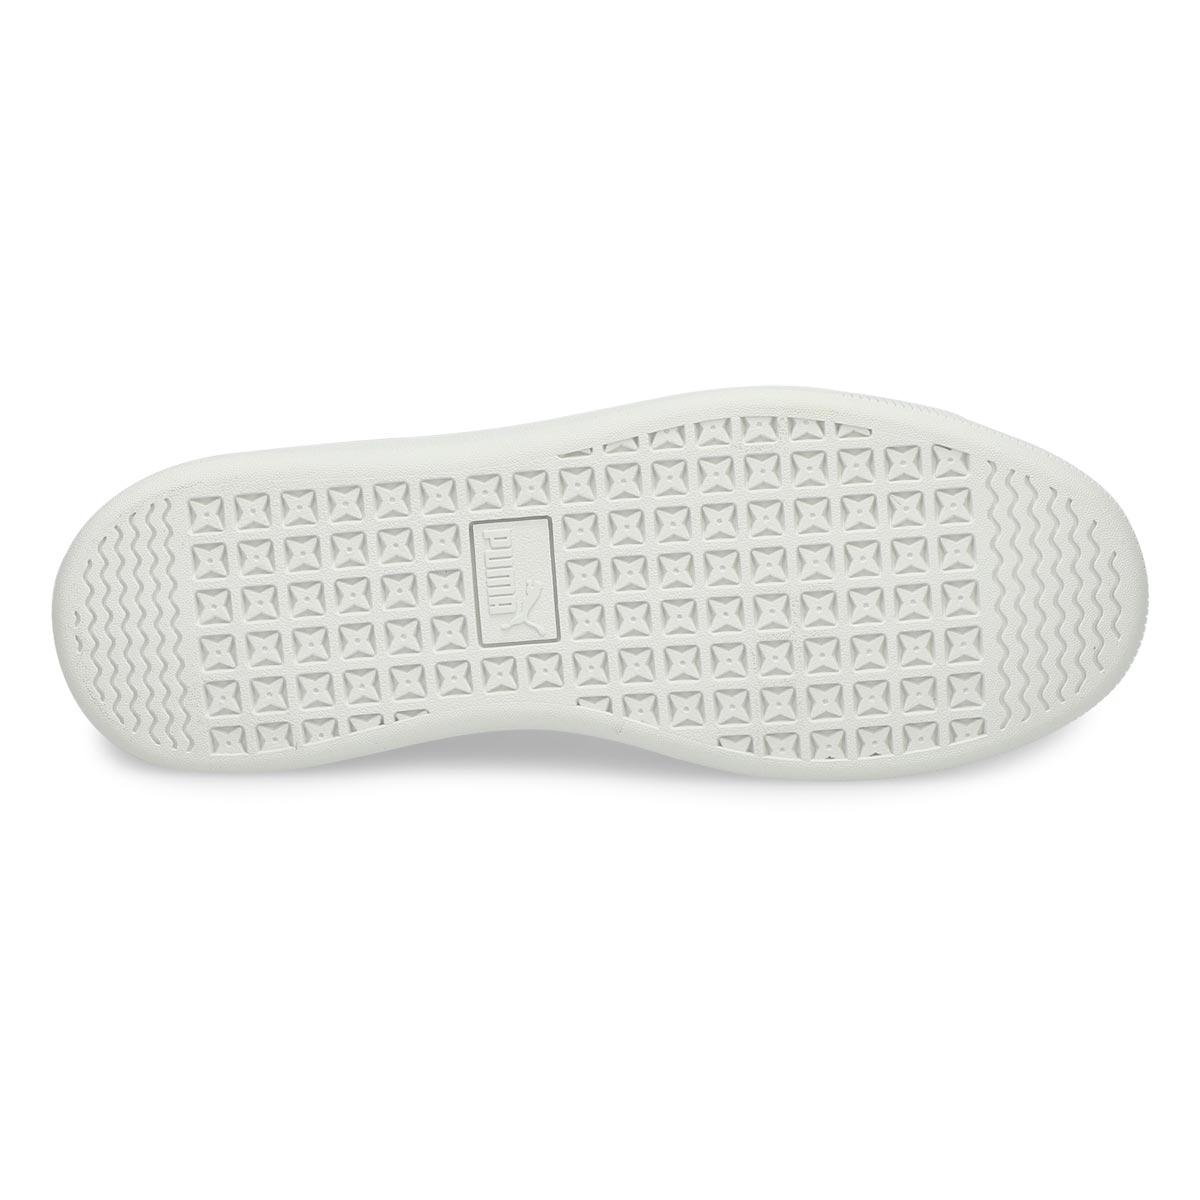 Women's Pma Vikky V2 Cat Sneaker - White/grey